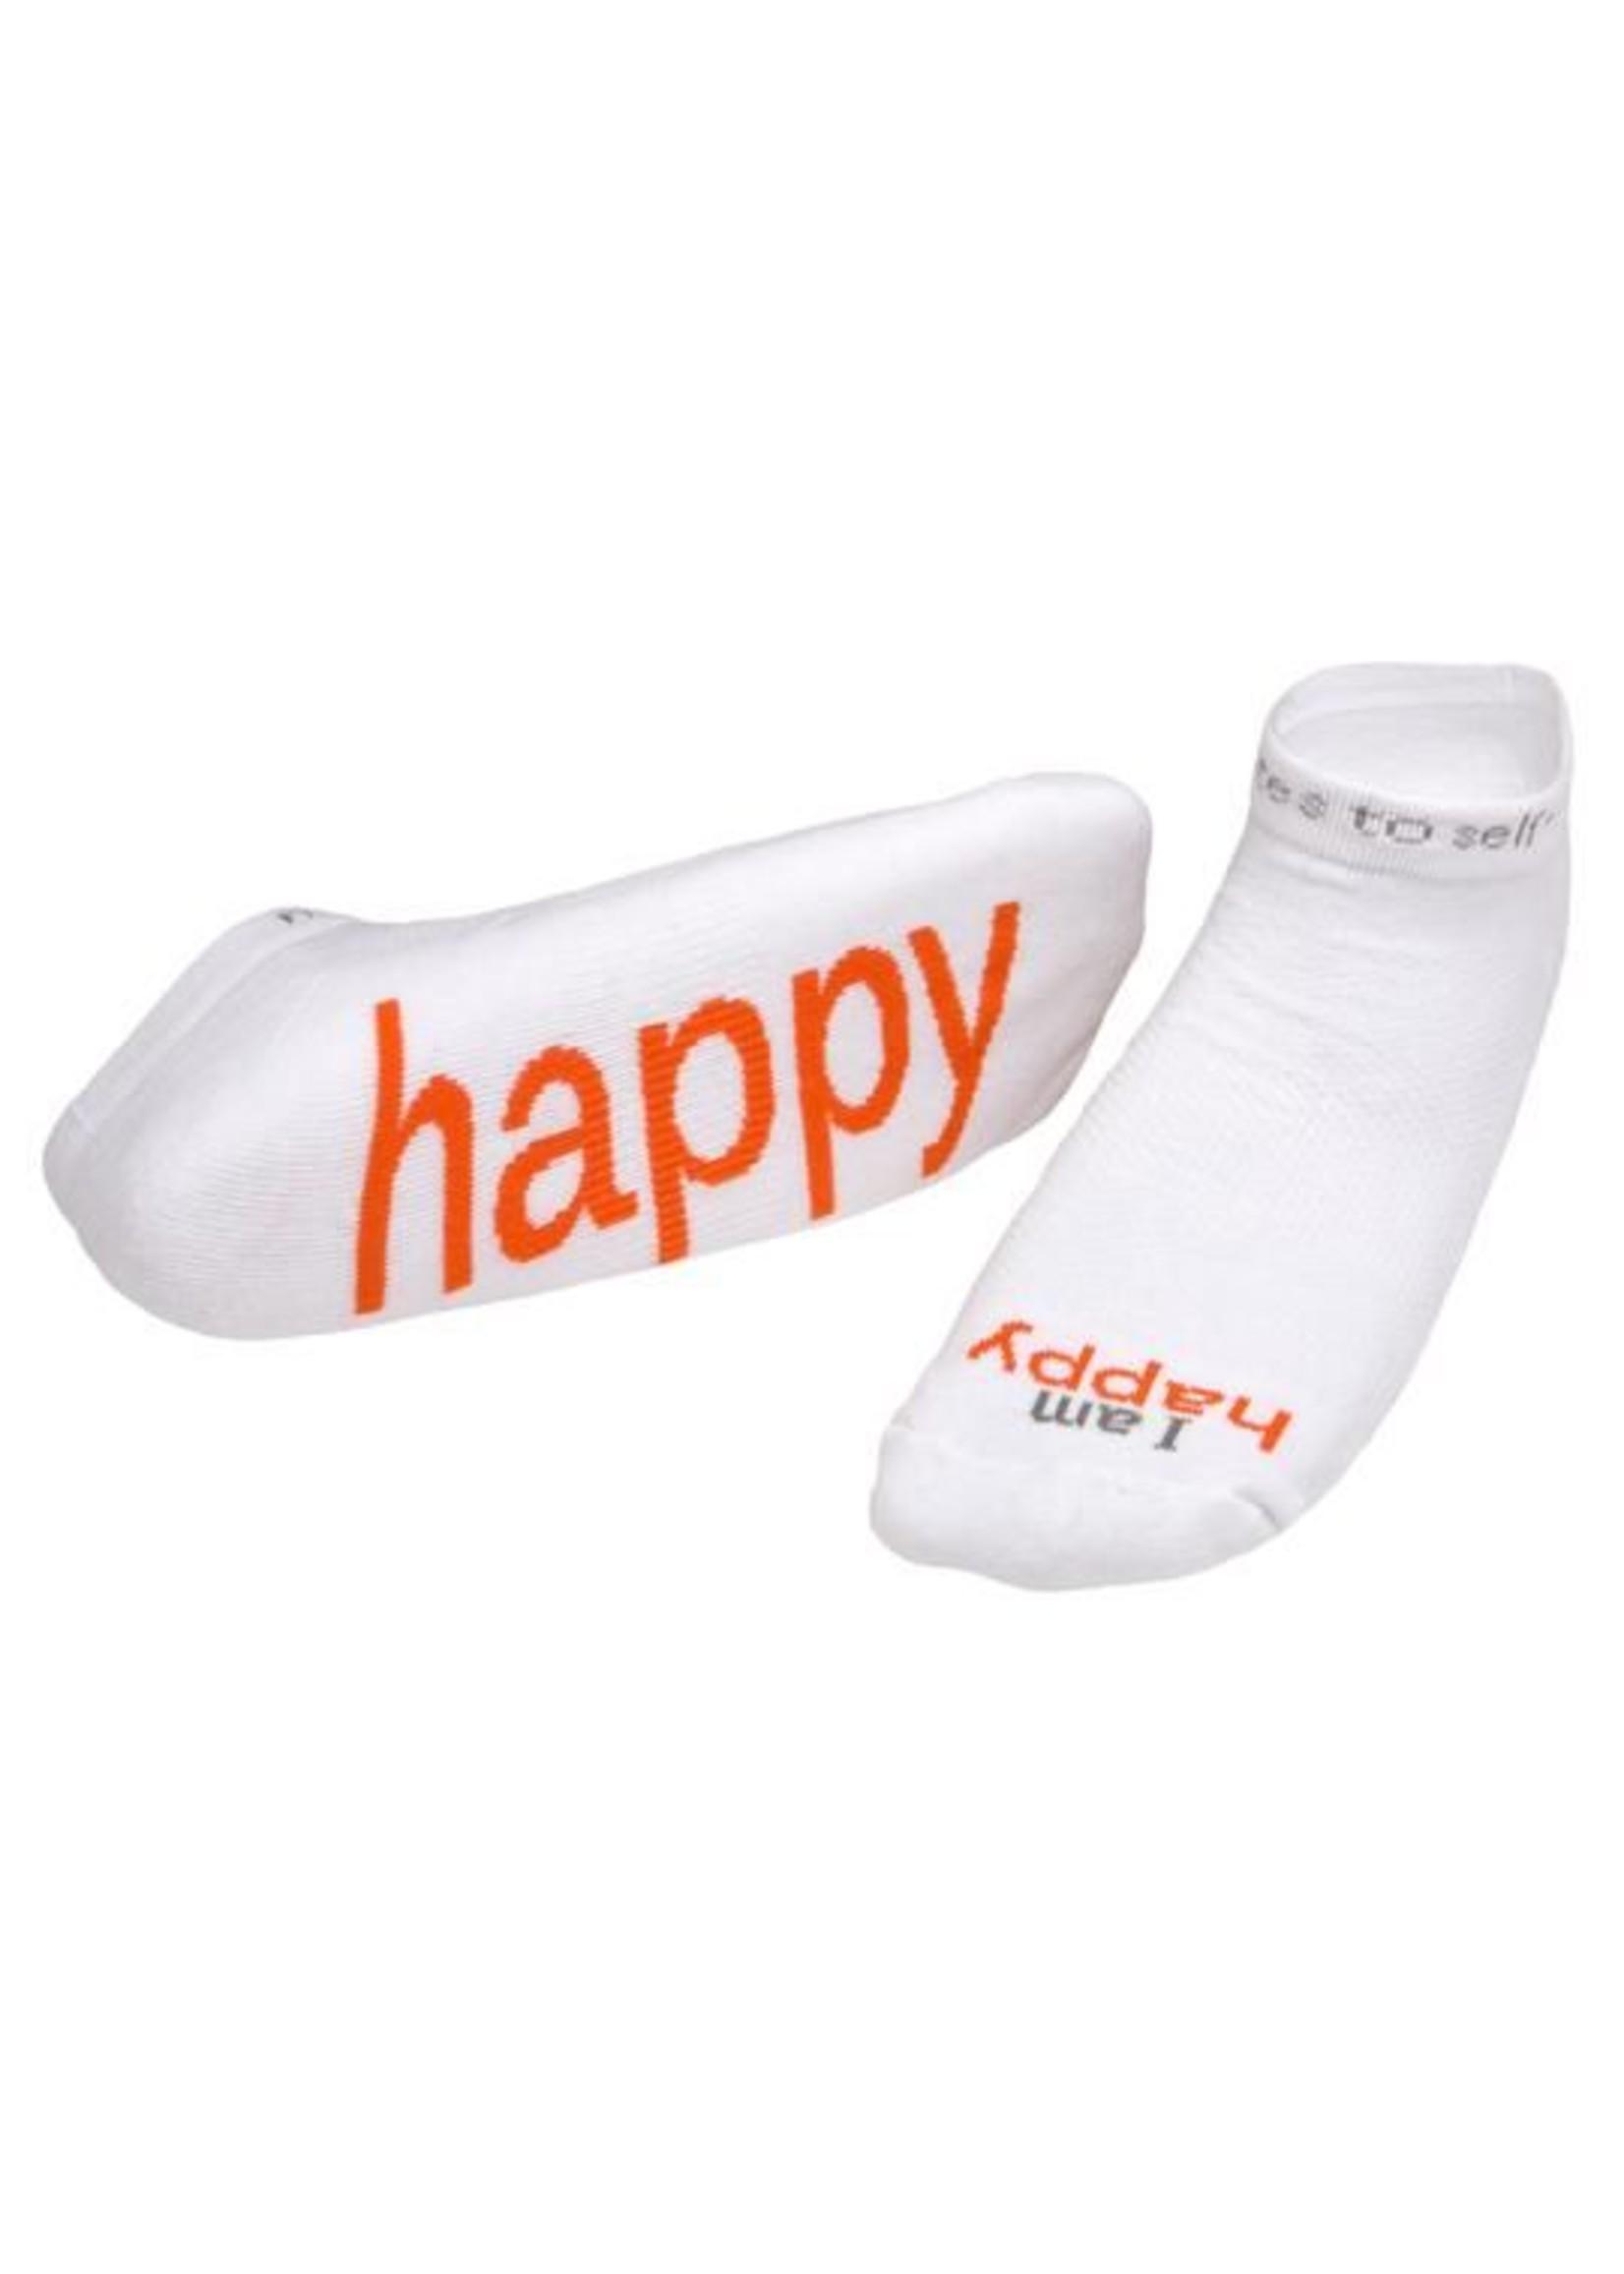 Notes to Self I Am Happy Socks White Kids S